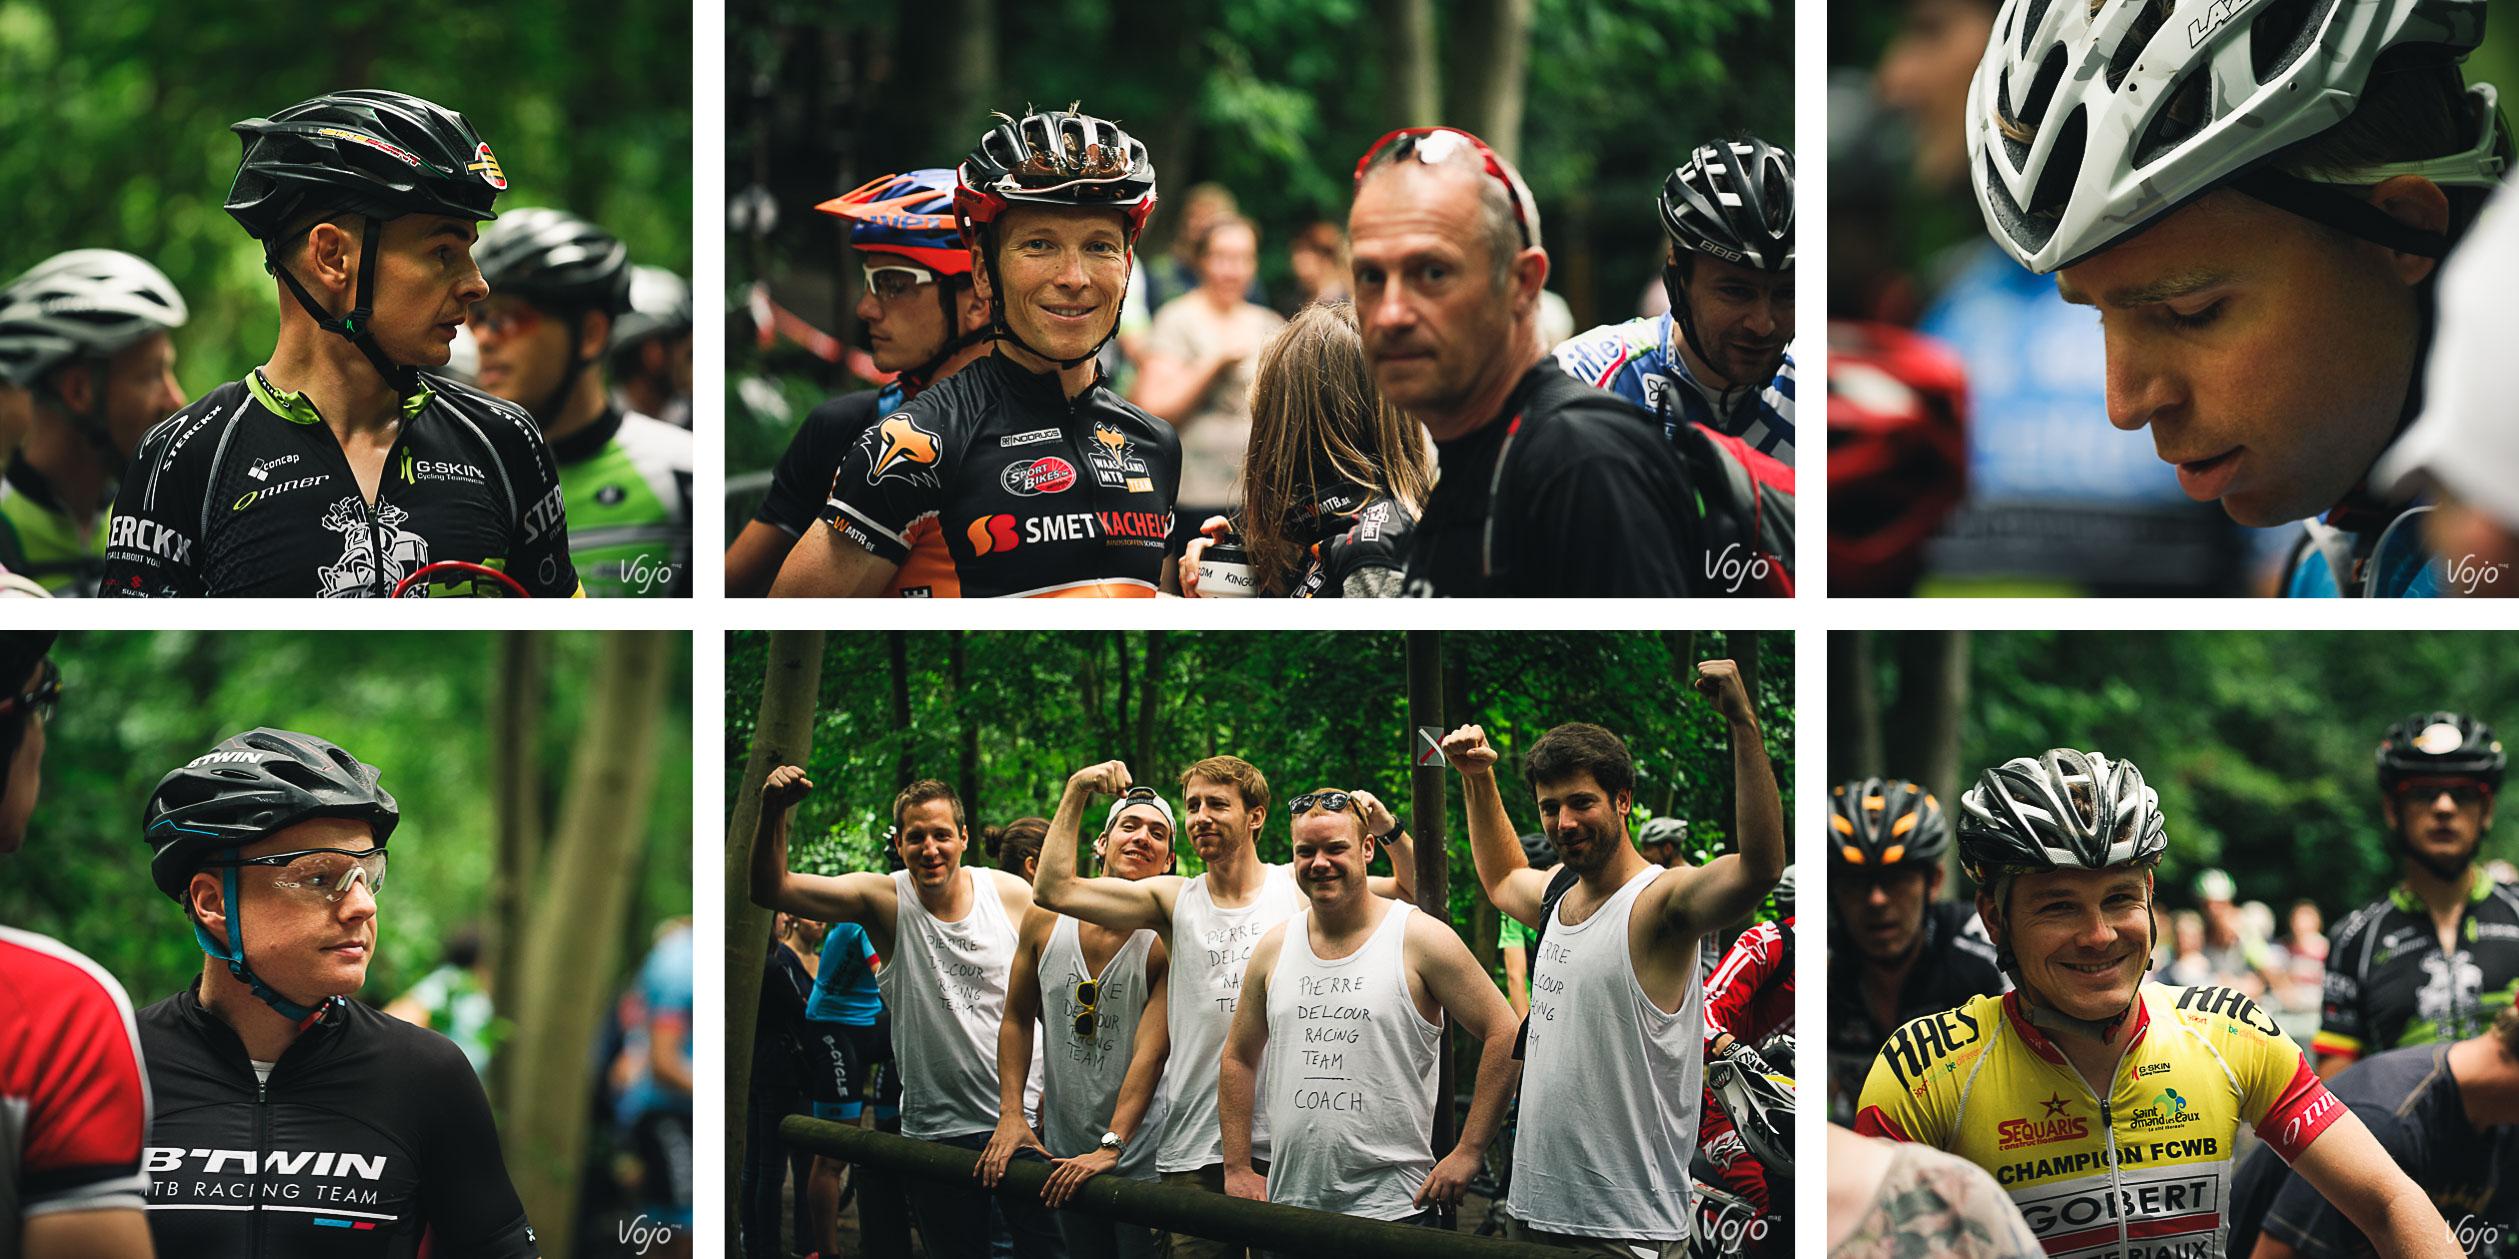 1-Championnat_Belgique_Marathon_2015_Frans_Claes_Copyright_VojoMagdotcom